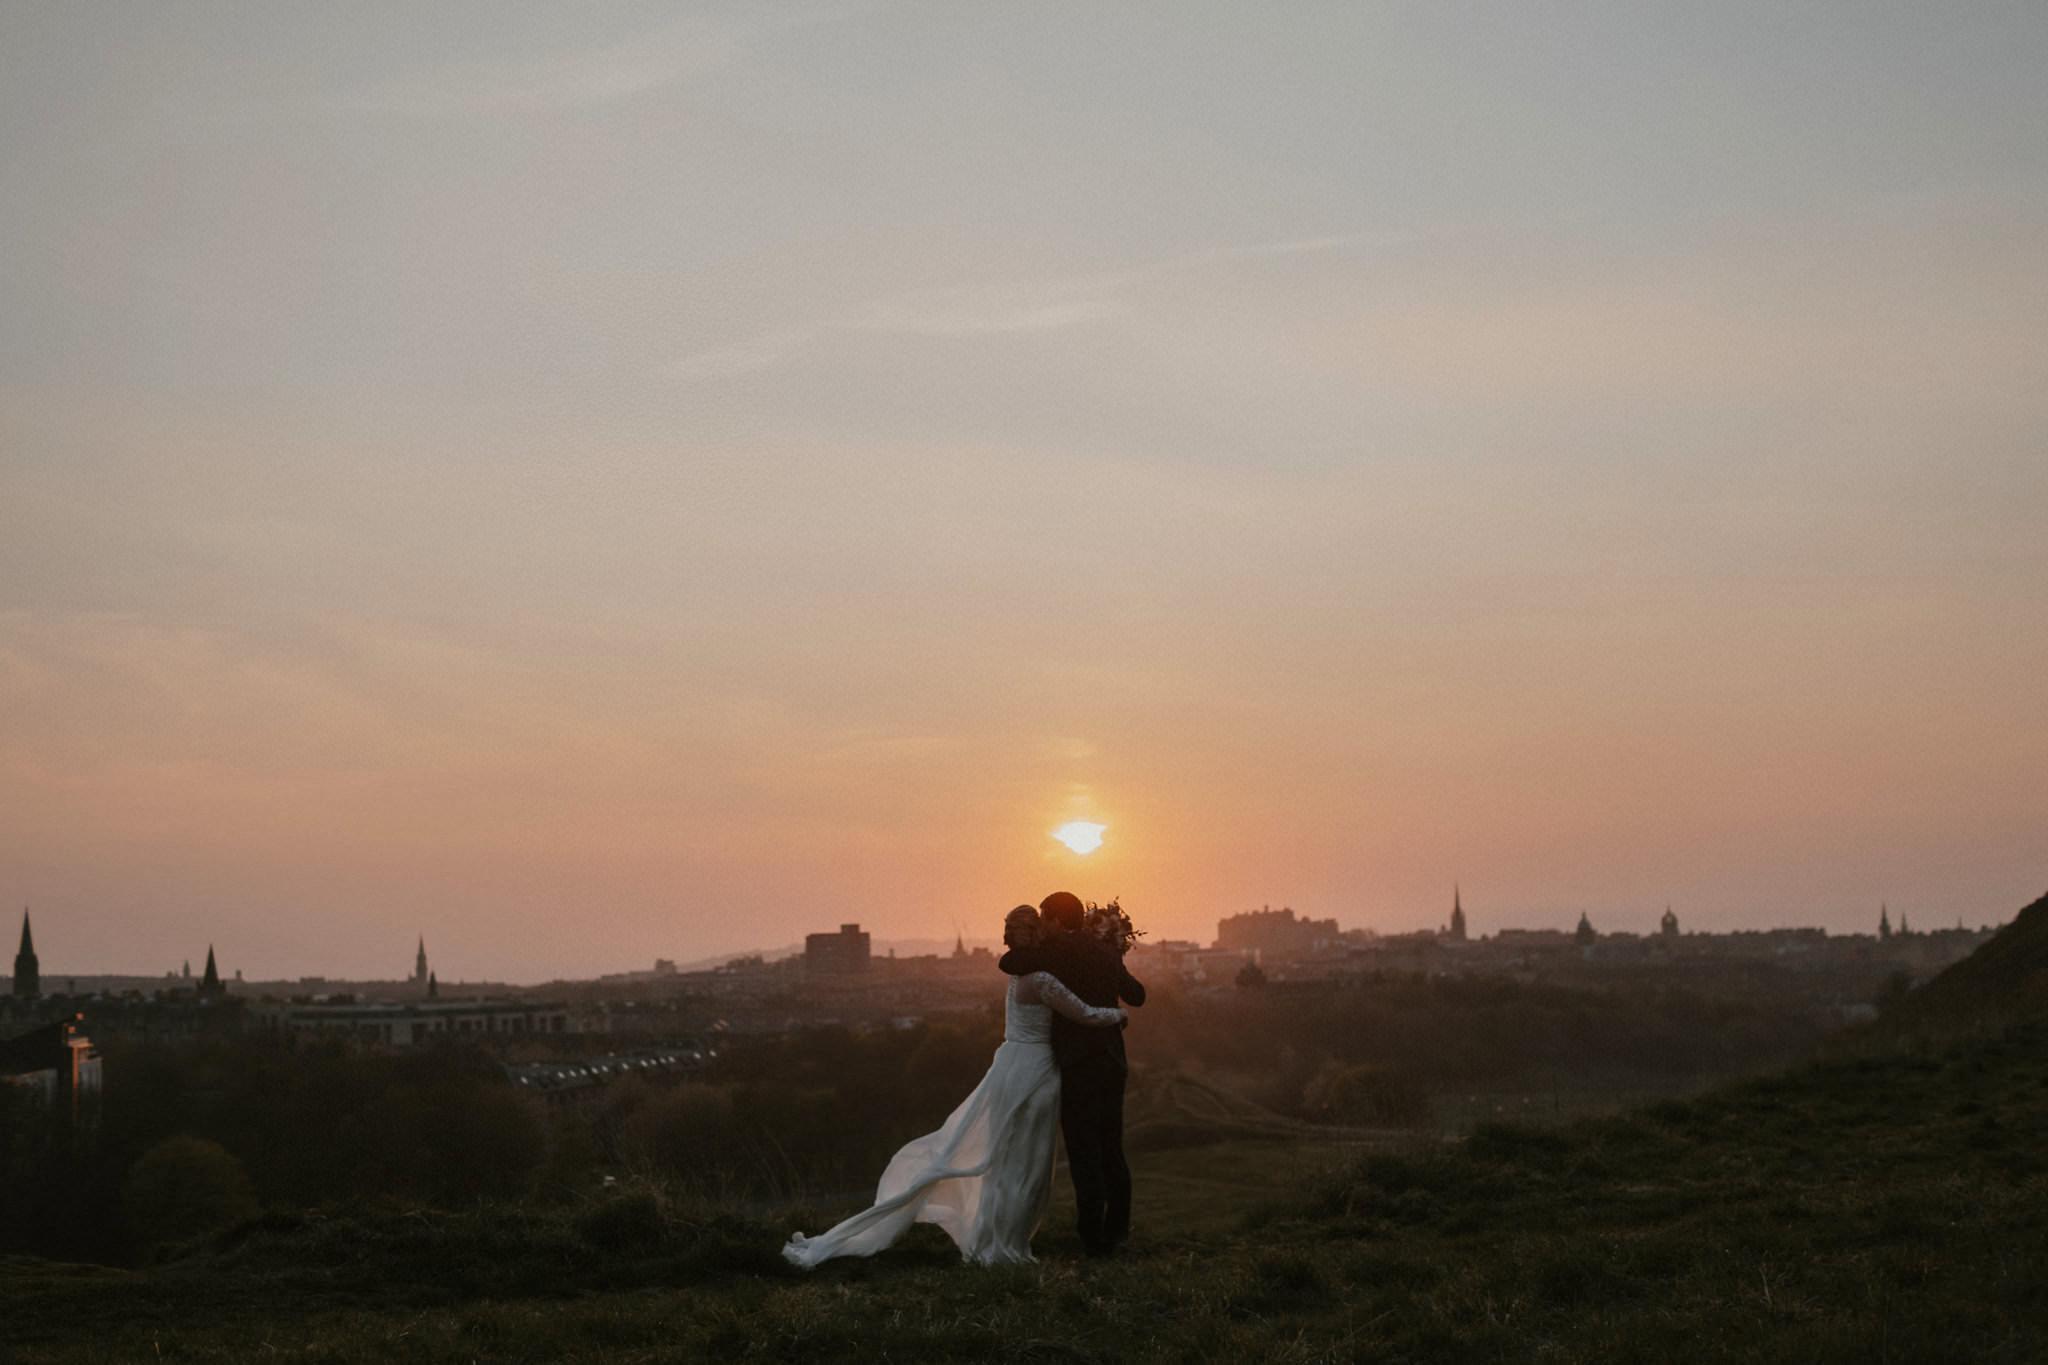 Edinburgh wedding photography couple embrace on Arthur's seat at sunset